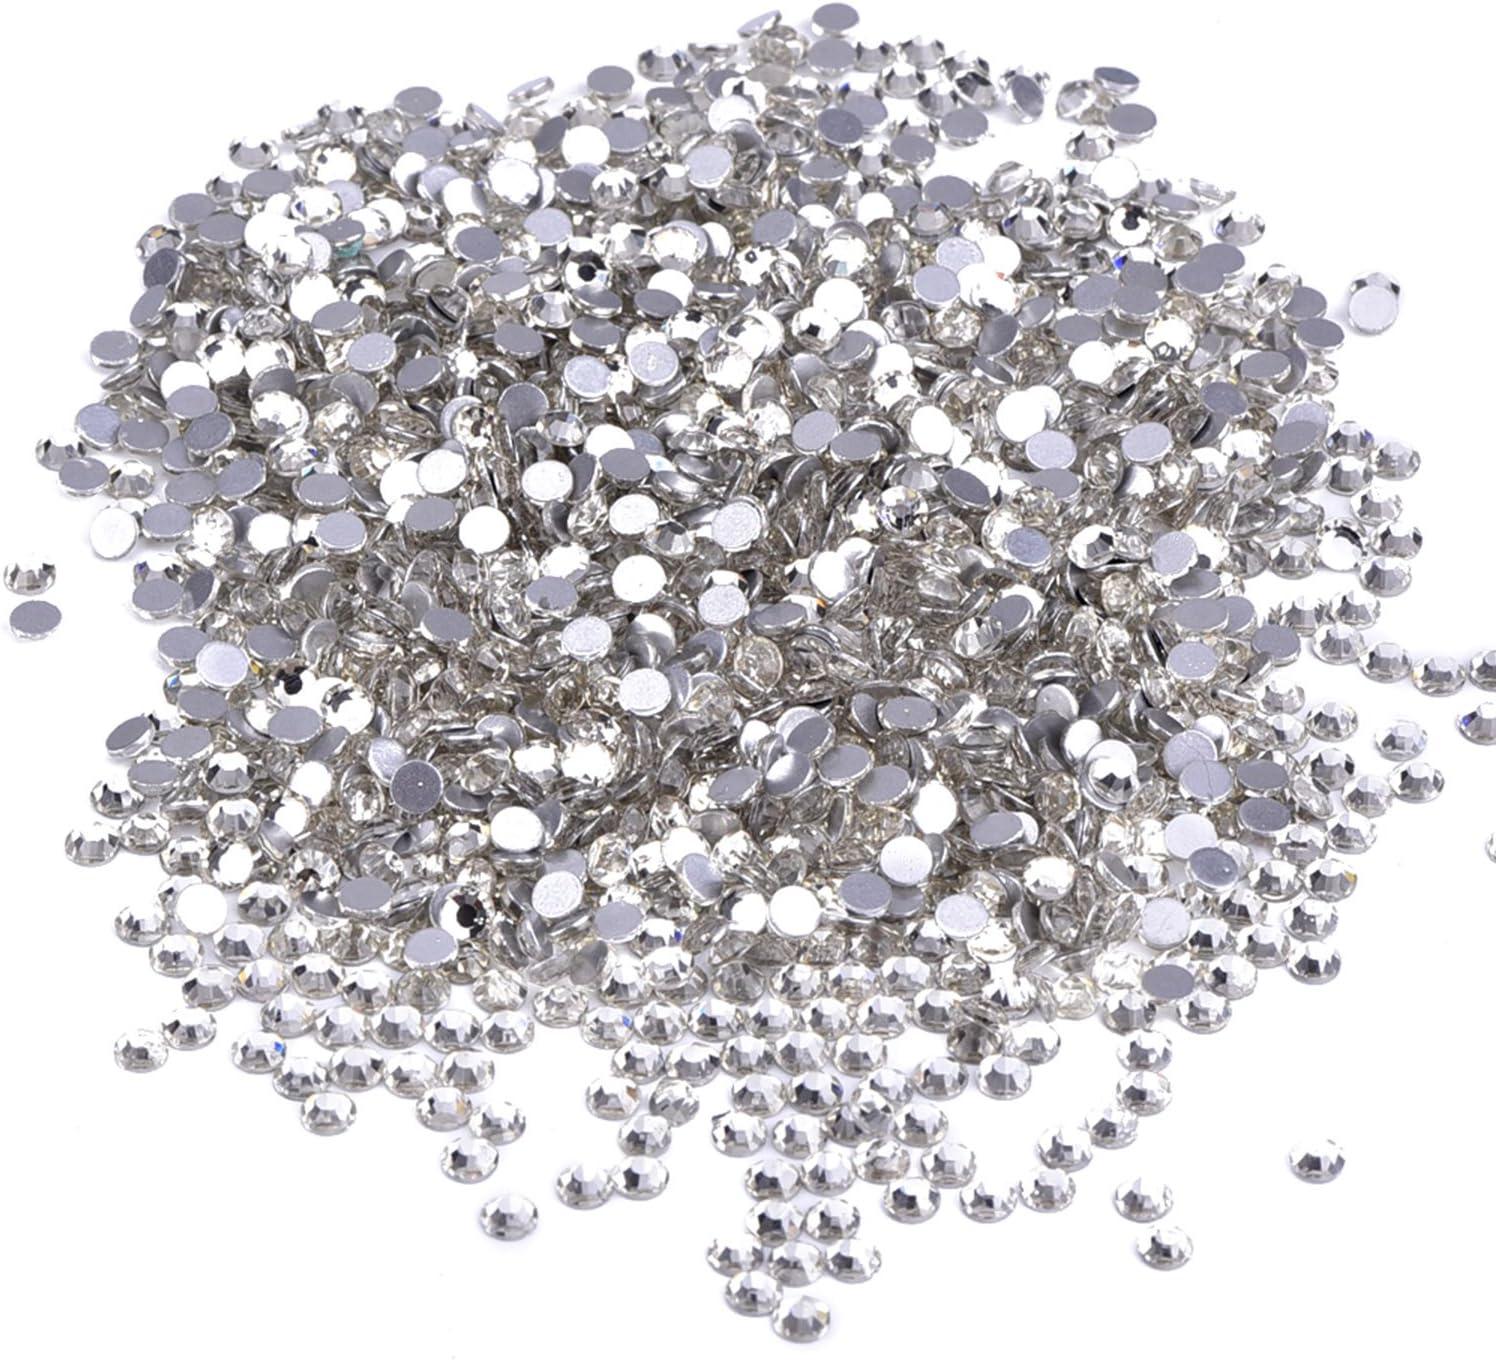 1440 Paquete Crystal Posterior Plana Diamantes de Imitaci/ón Espalda Plana Flat Back Rhinestone No Autoadhesivo 4mm